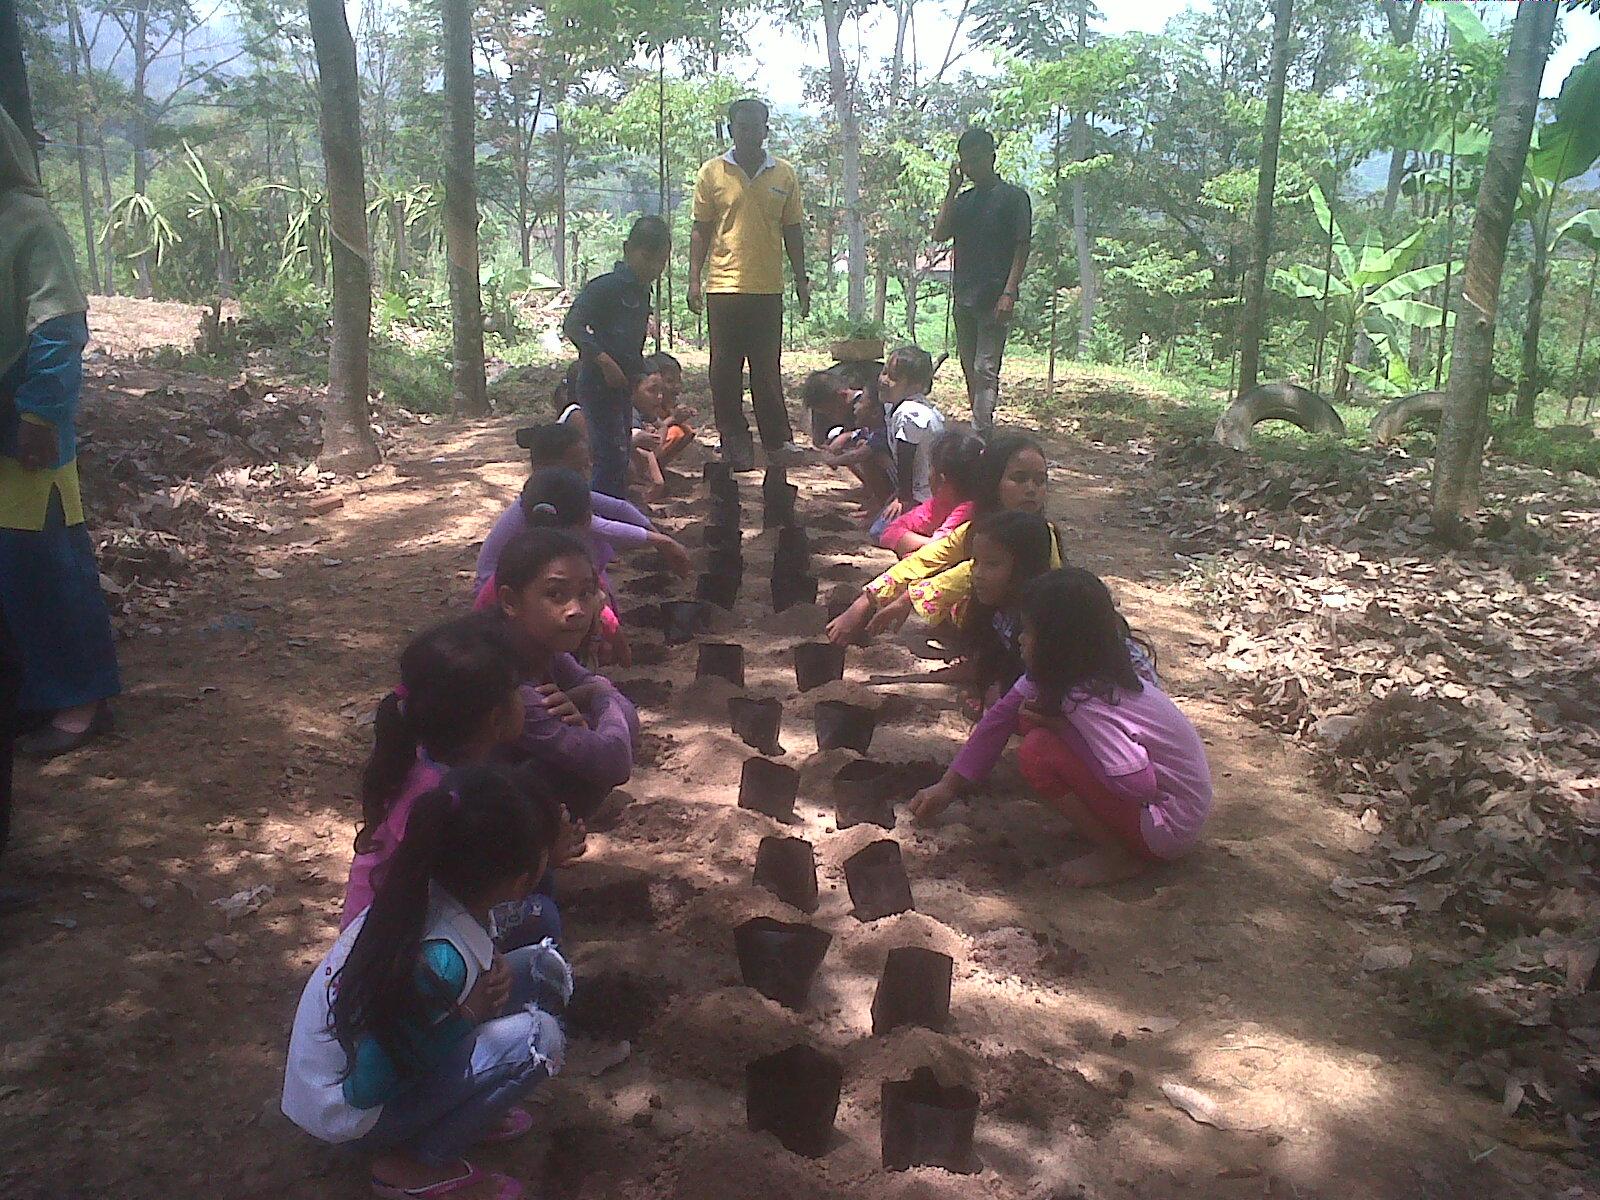 Agro Wisata Kampoeng Karet Gunung Lawu Januari 2016 Asyiknya Lomba